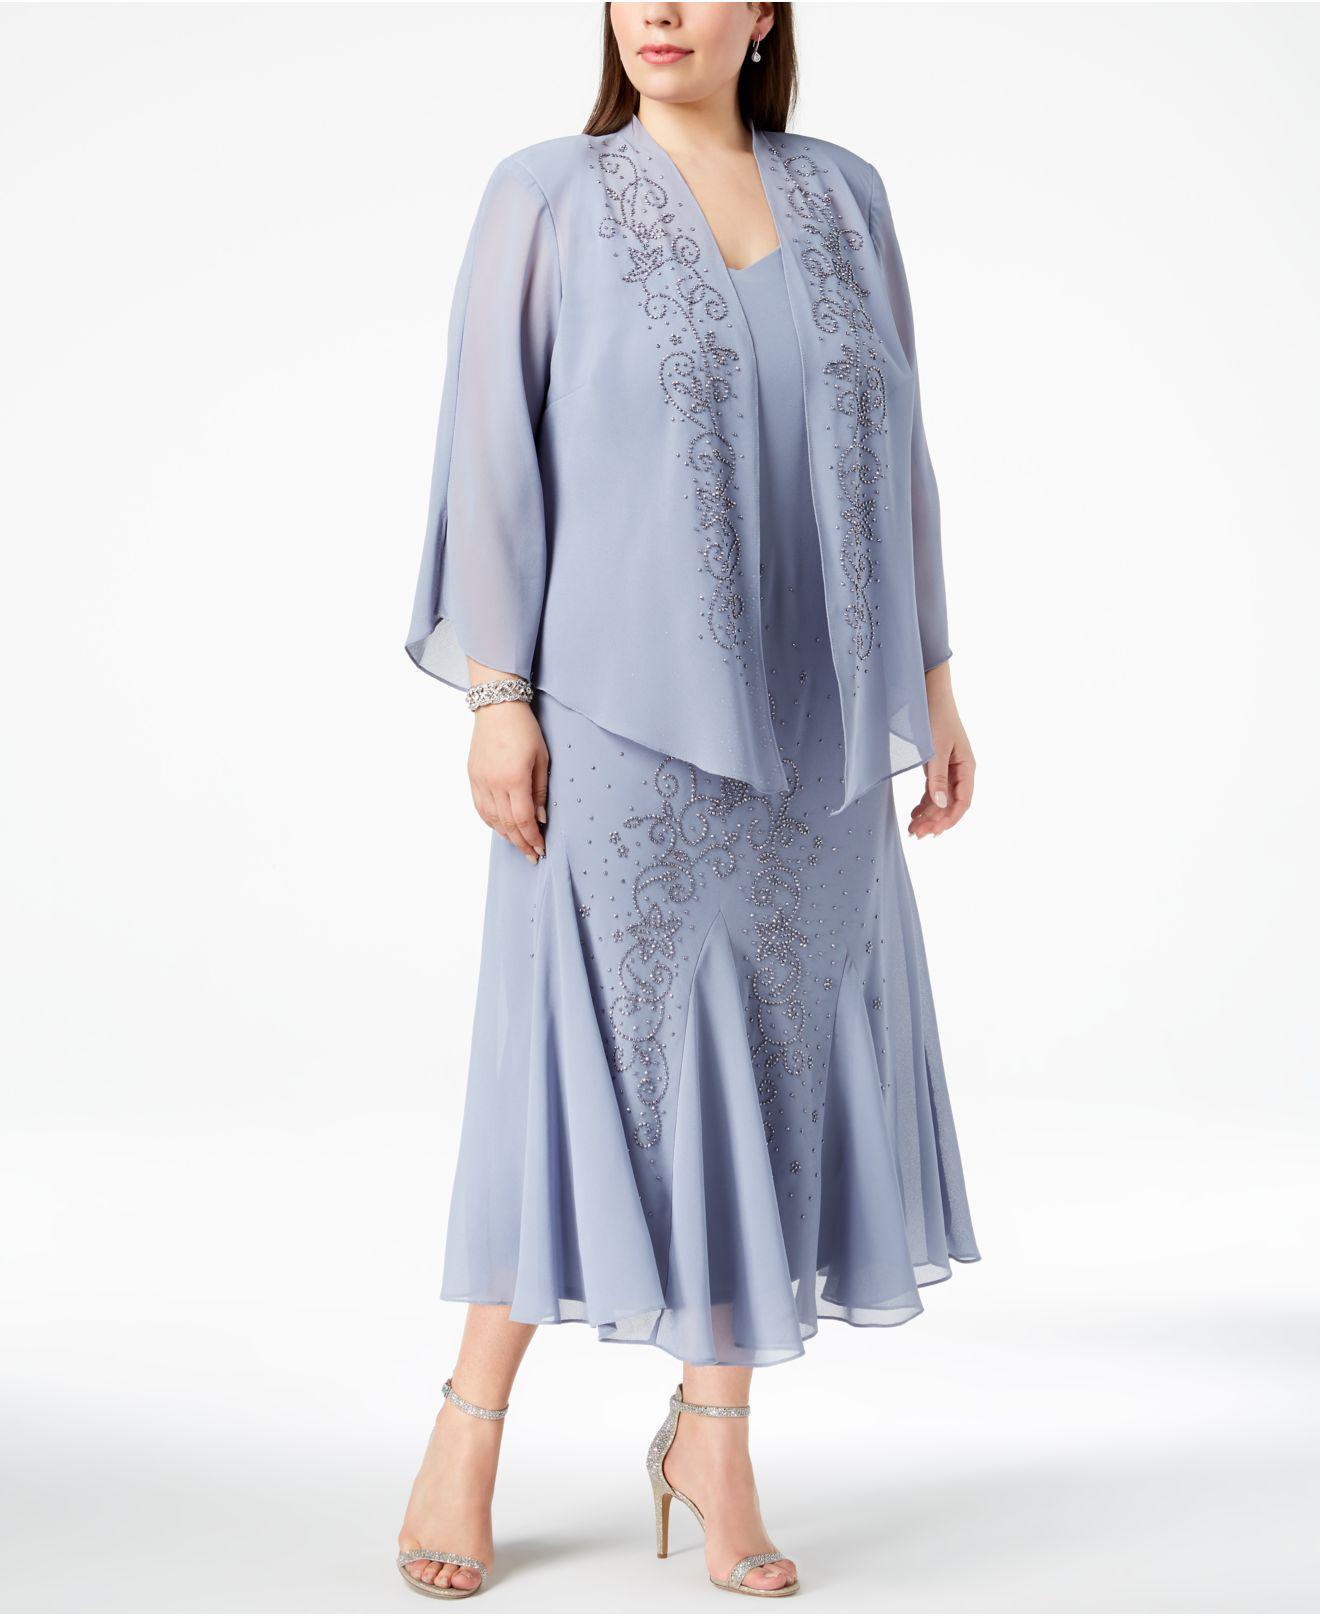 d6251f00d73f R   M Richards. Women s Blue R m Richards Plus Size Beaded V-neck Dress And  Jacket